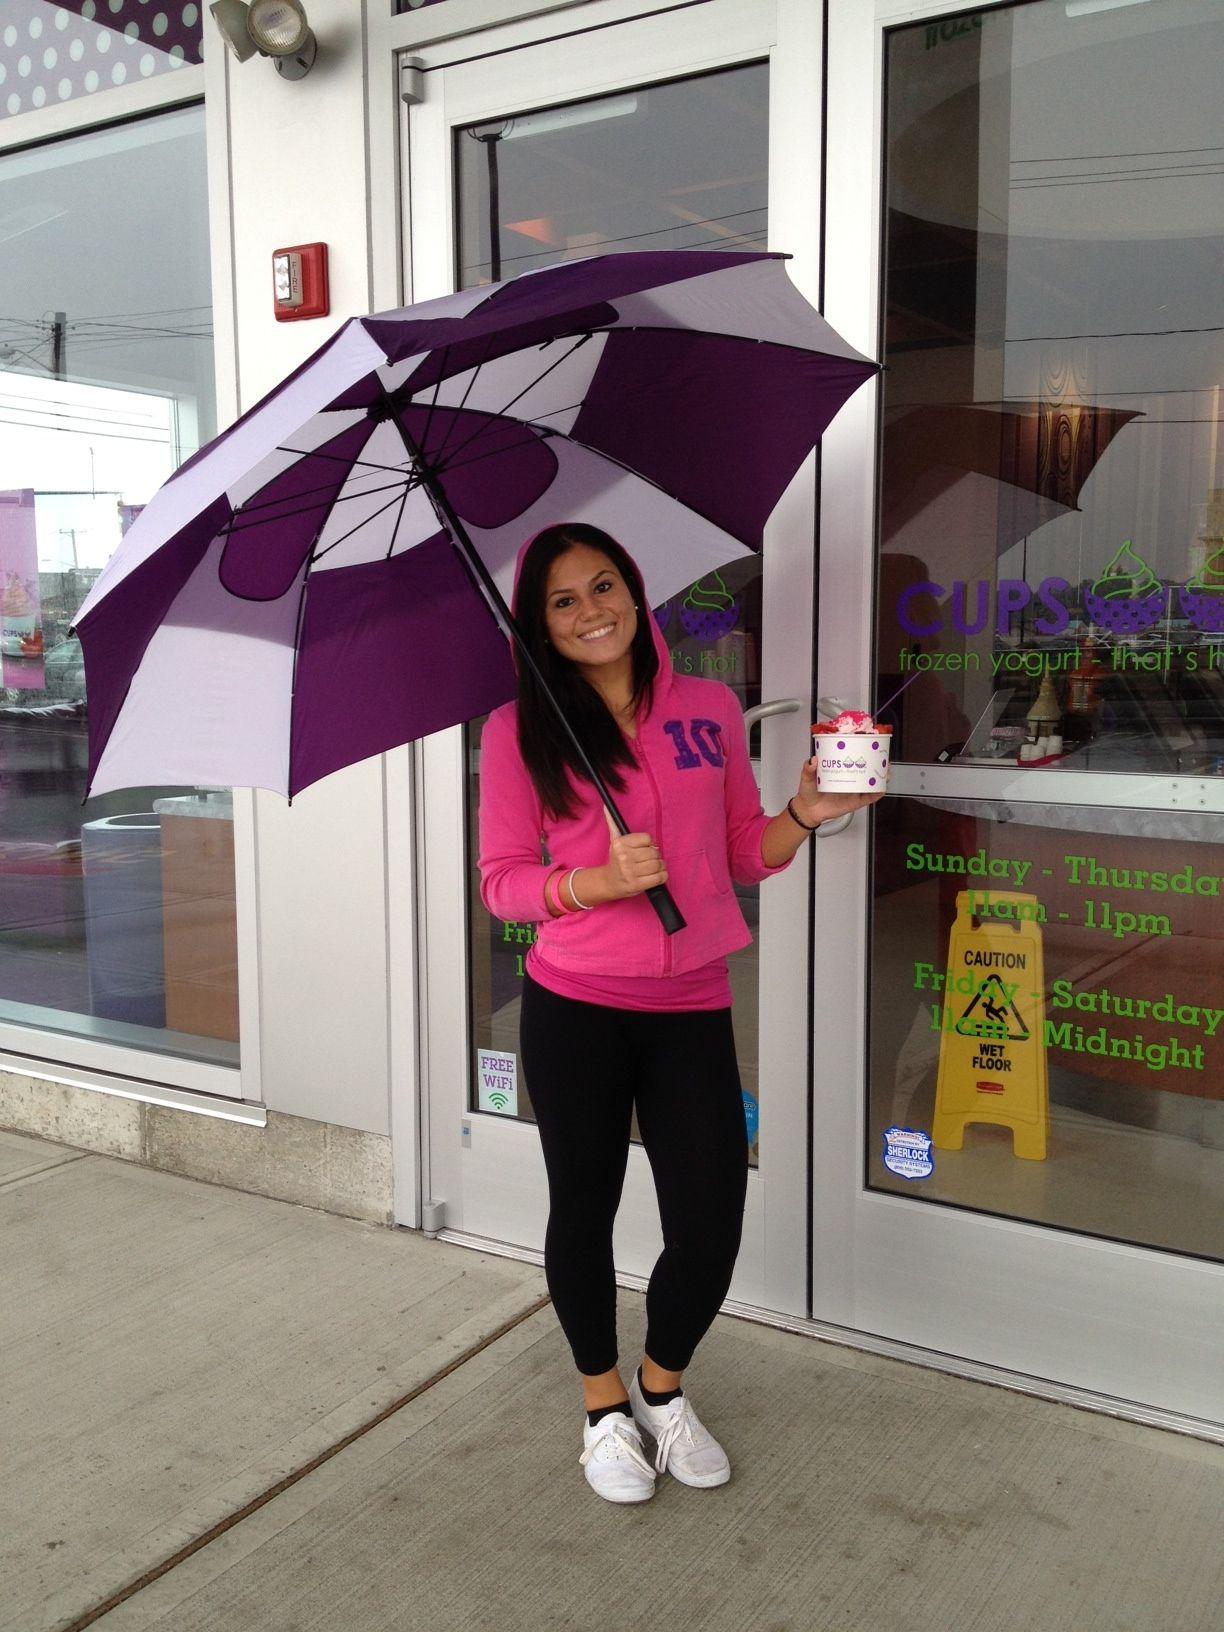 Rainy day @ #CUPS Paramus!